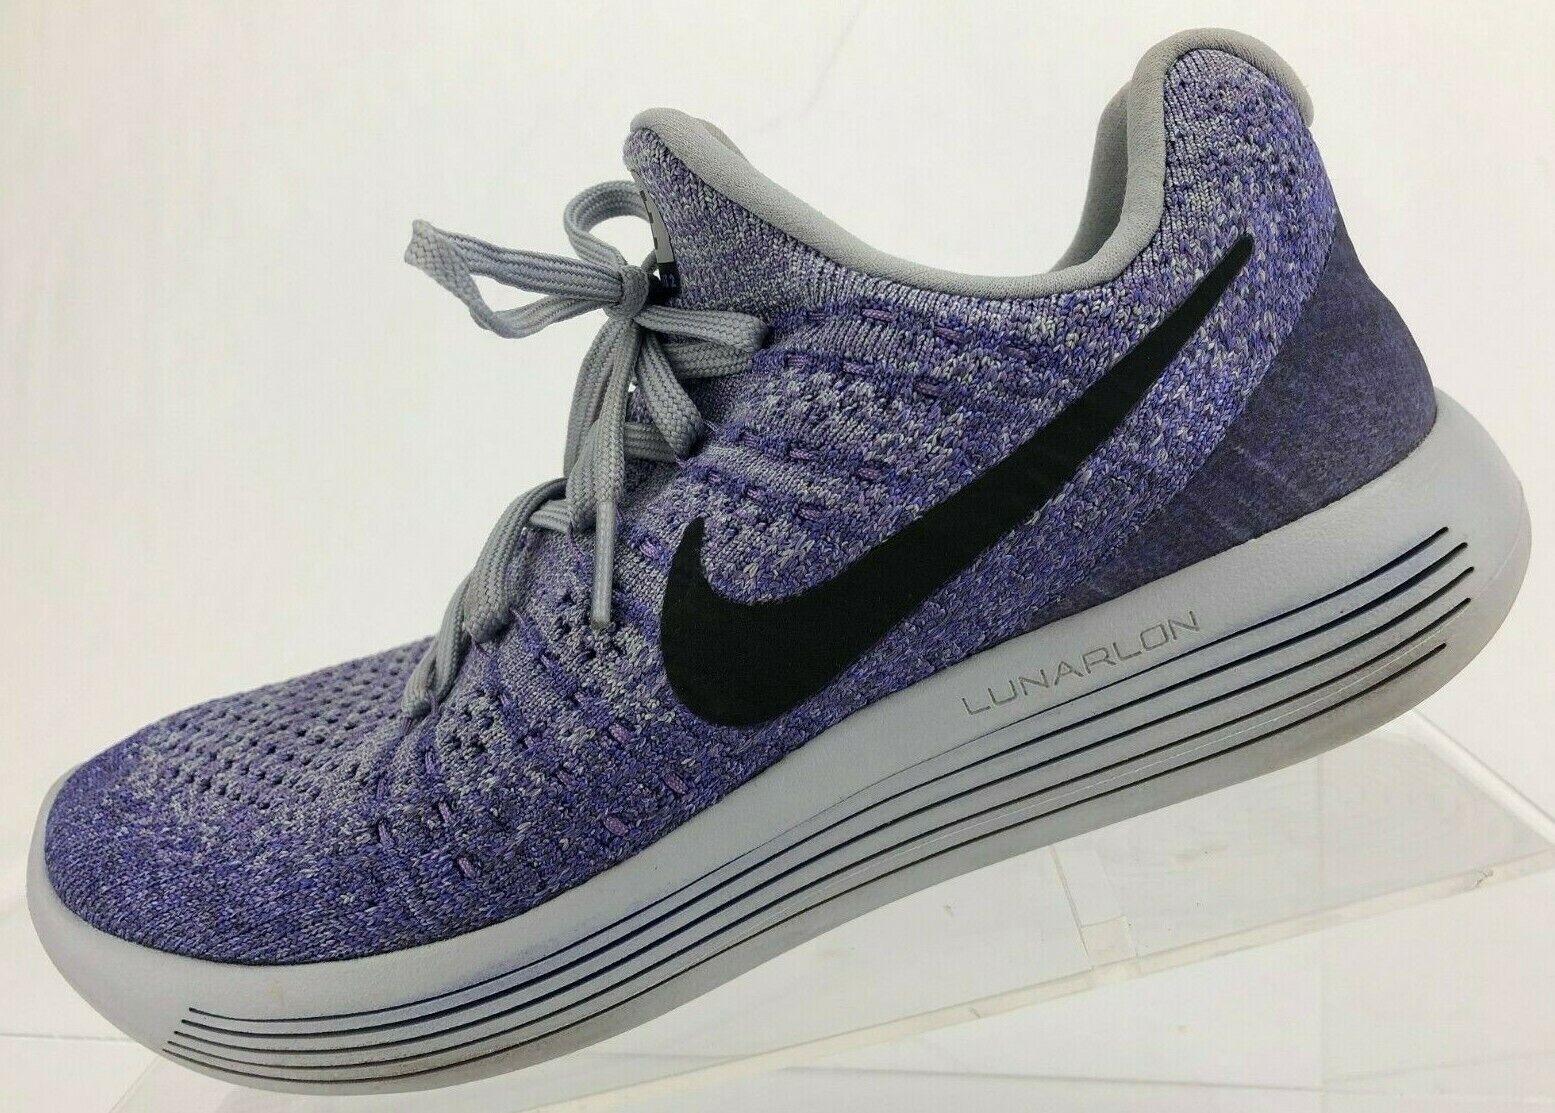 Nike Nike Nike LunarEpic Low Flyknit 2 Running scarpe viola Training scarpe da ginnastica donna Sz 7 ec9914